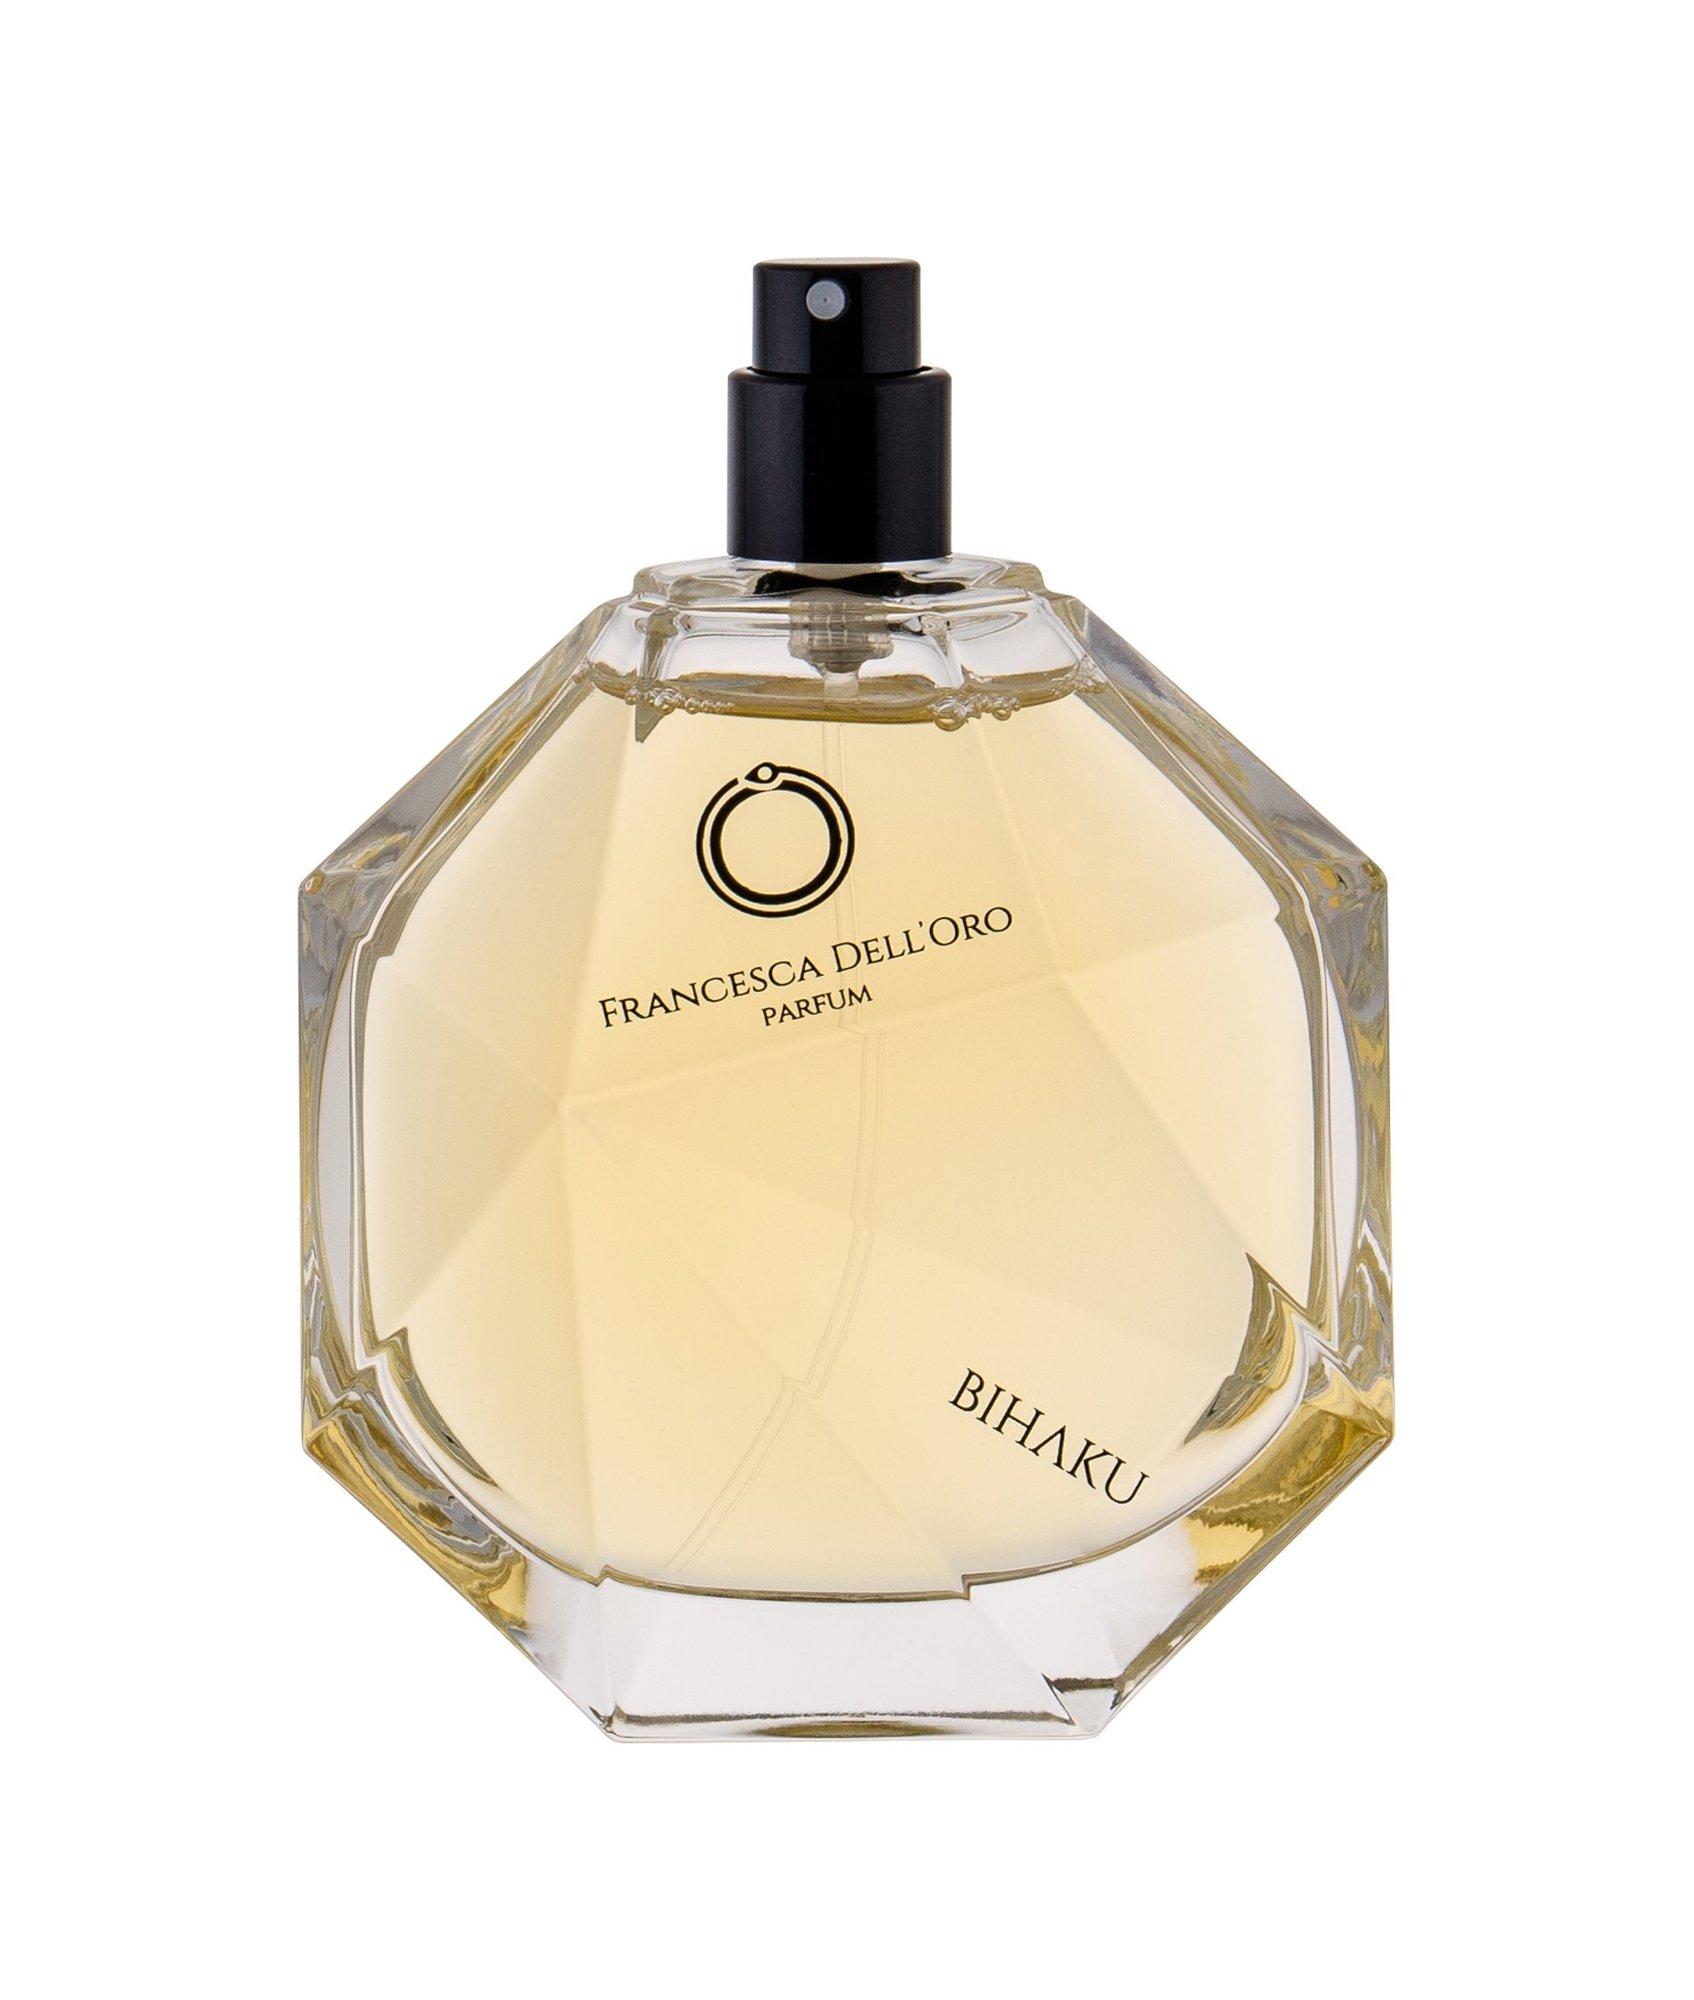 Francesca dell´Oro Bihaku Eau de Parfum 100ml